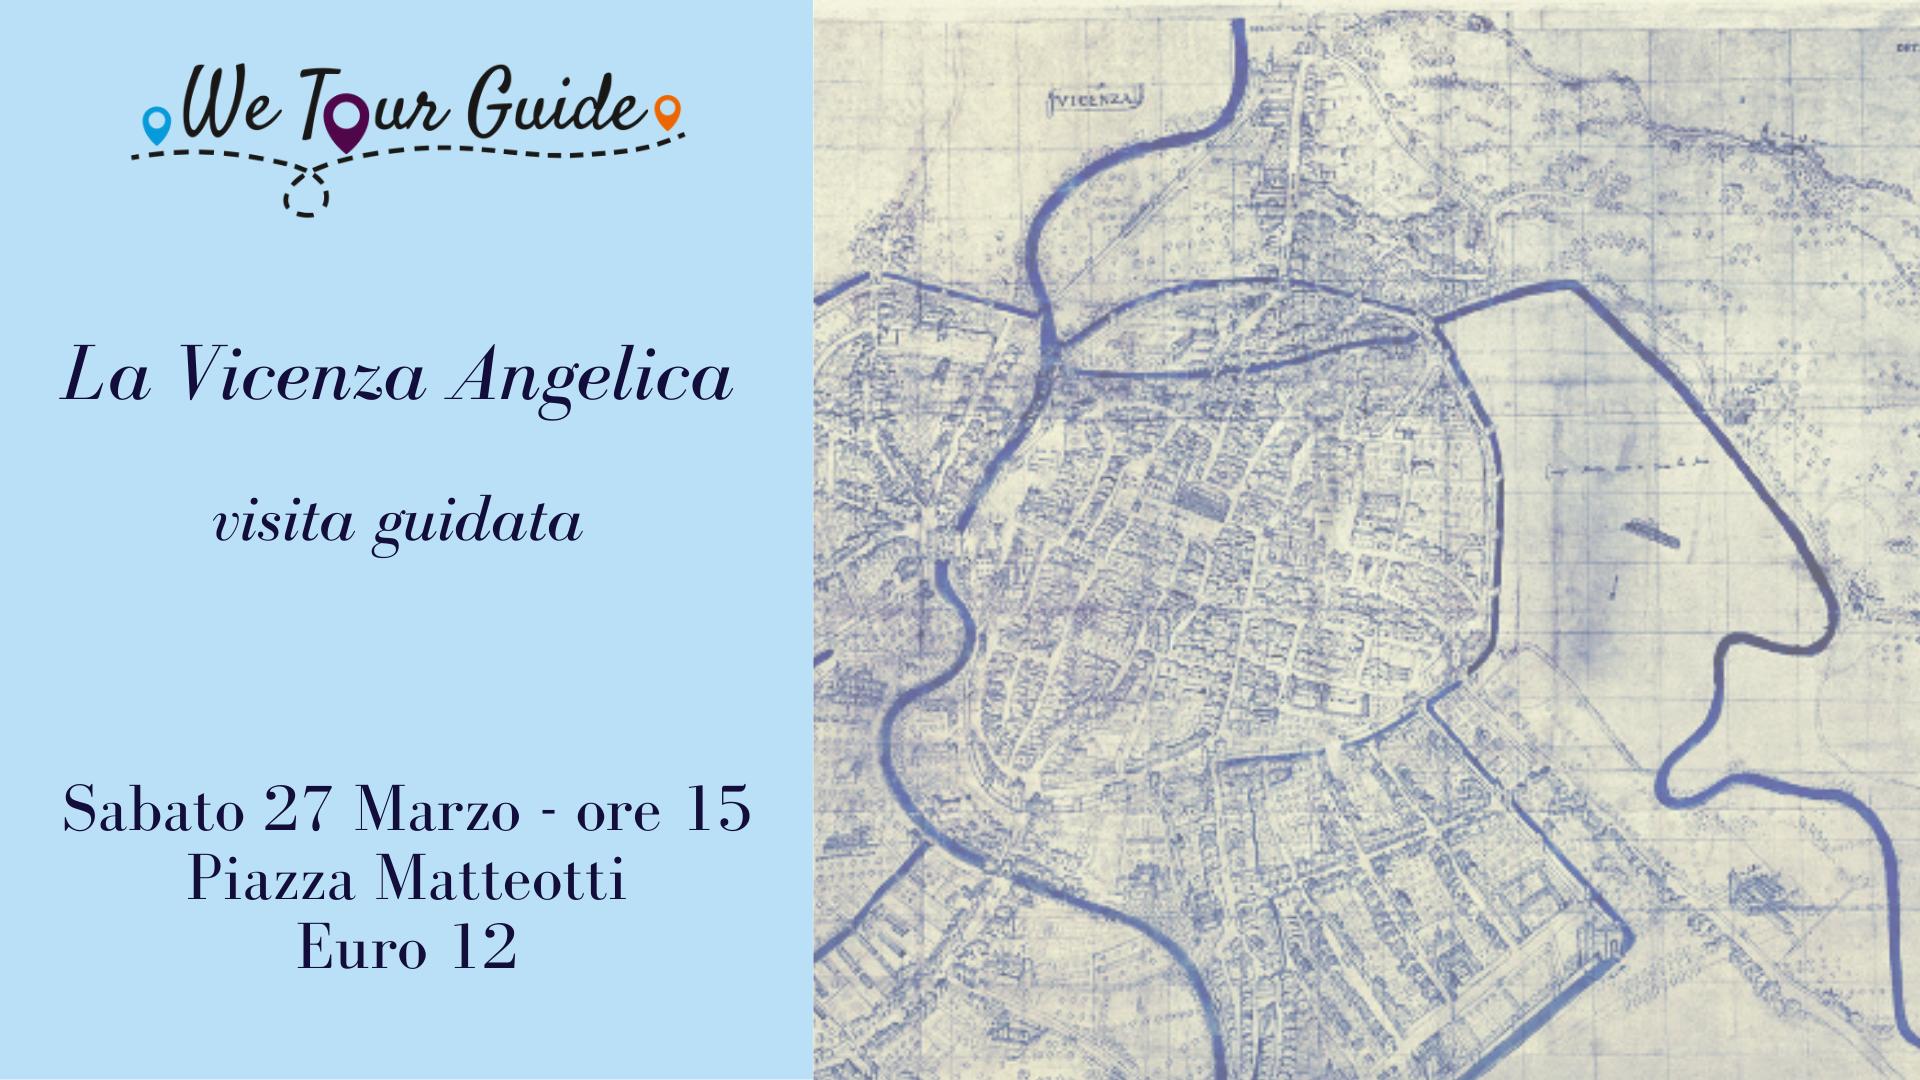 La Vicenza Angelica